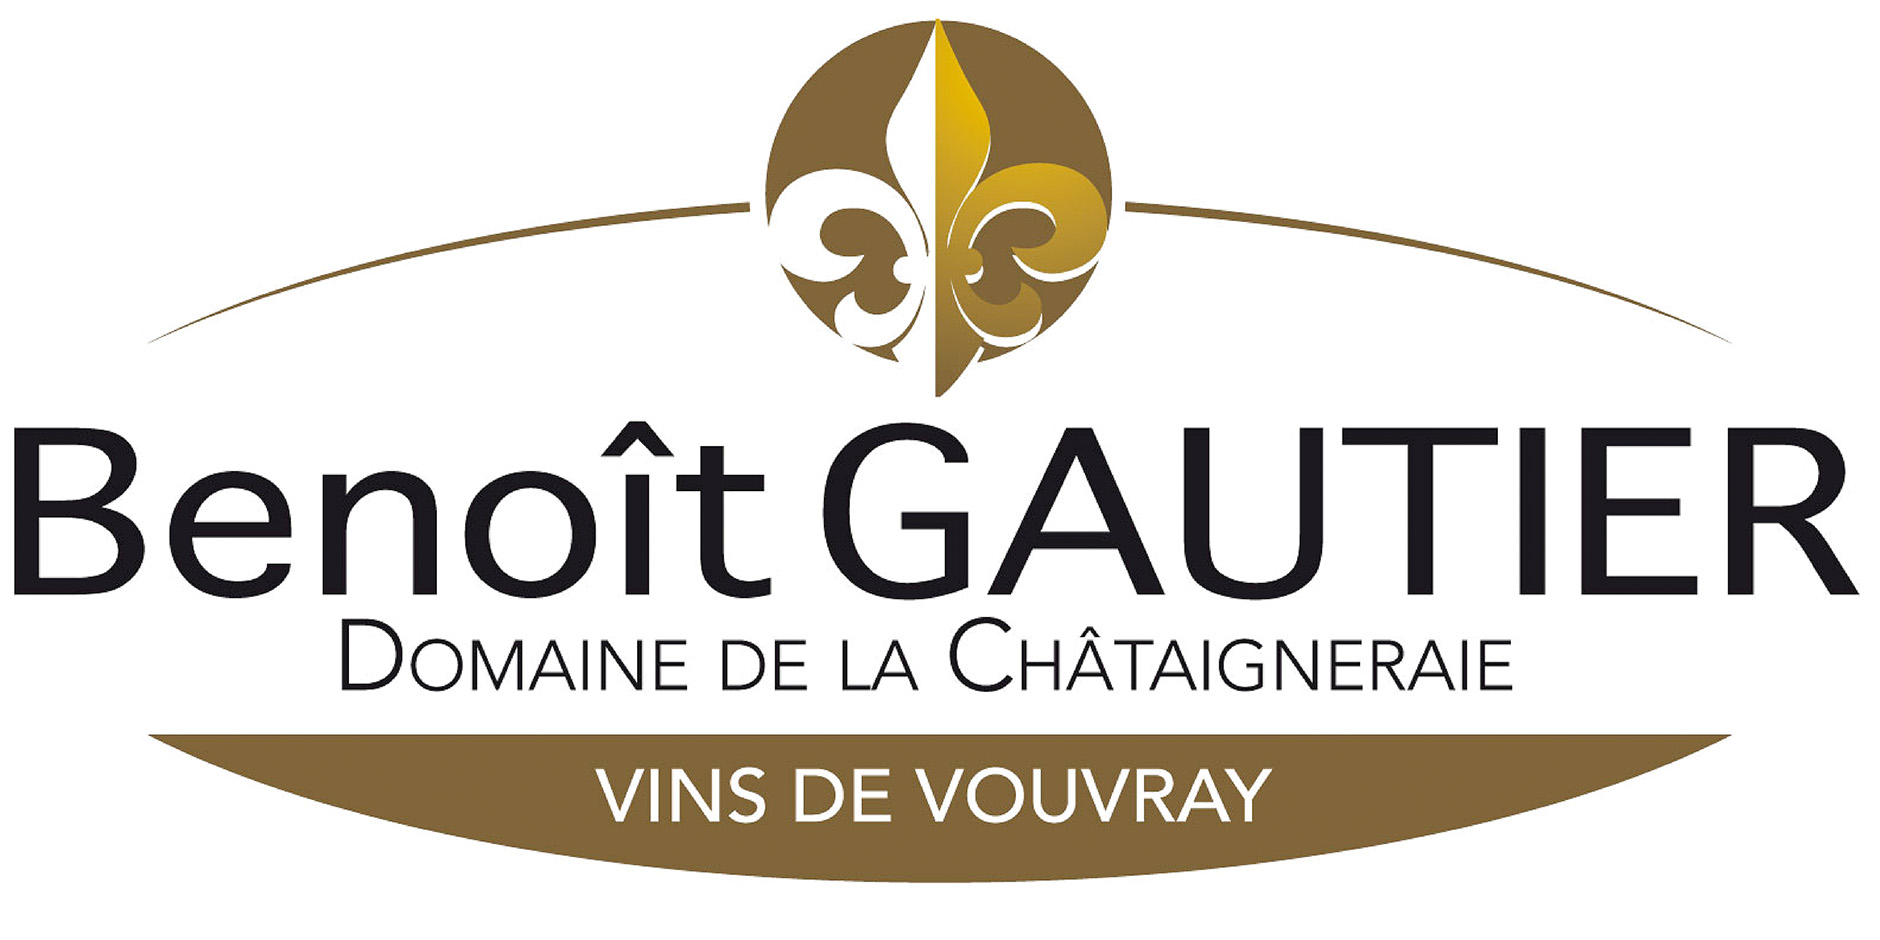 Gautier Benoit